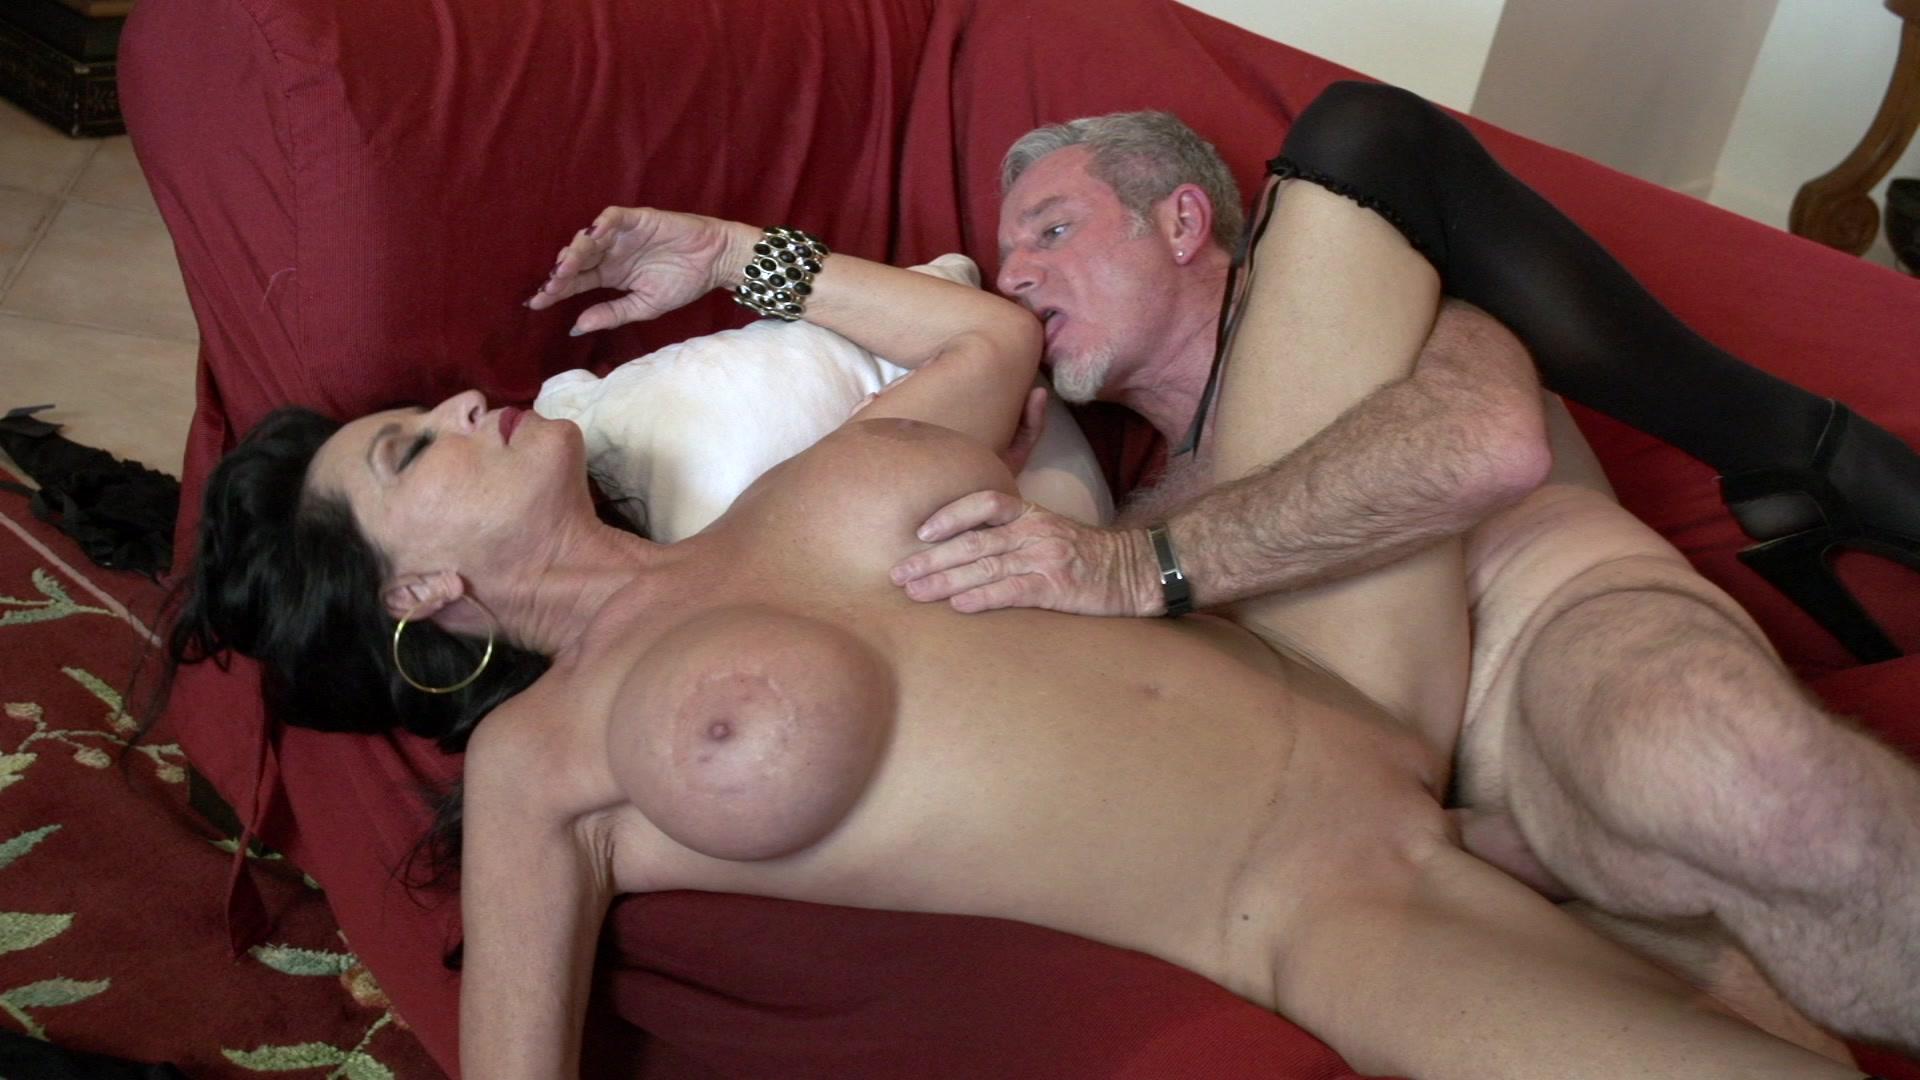 Big tits japanese granny fucking pics free porn images